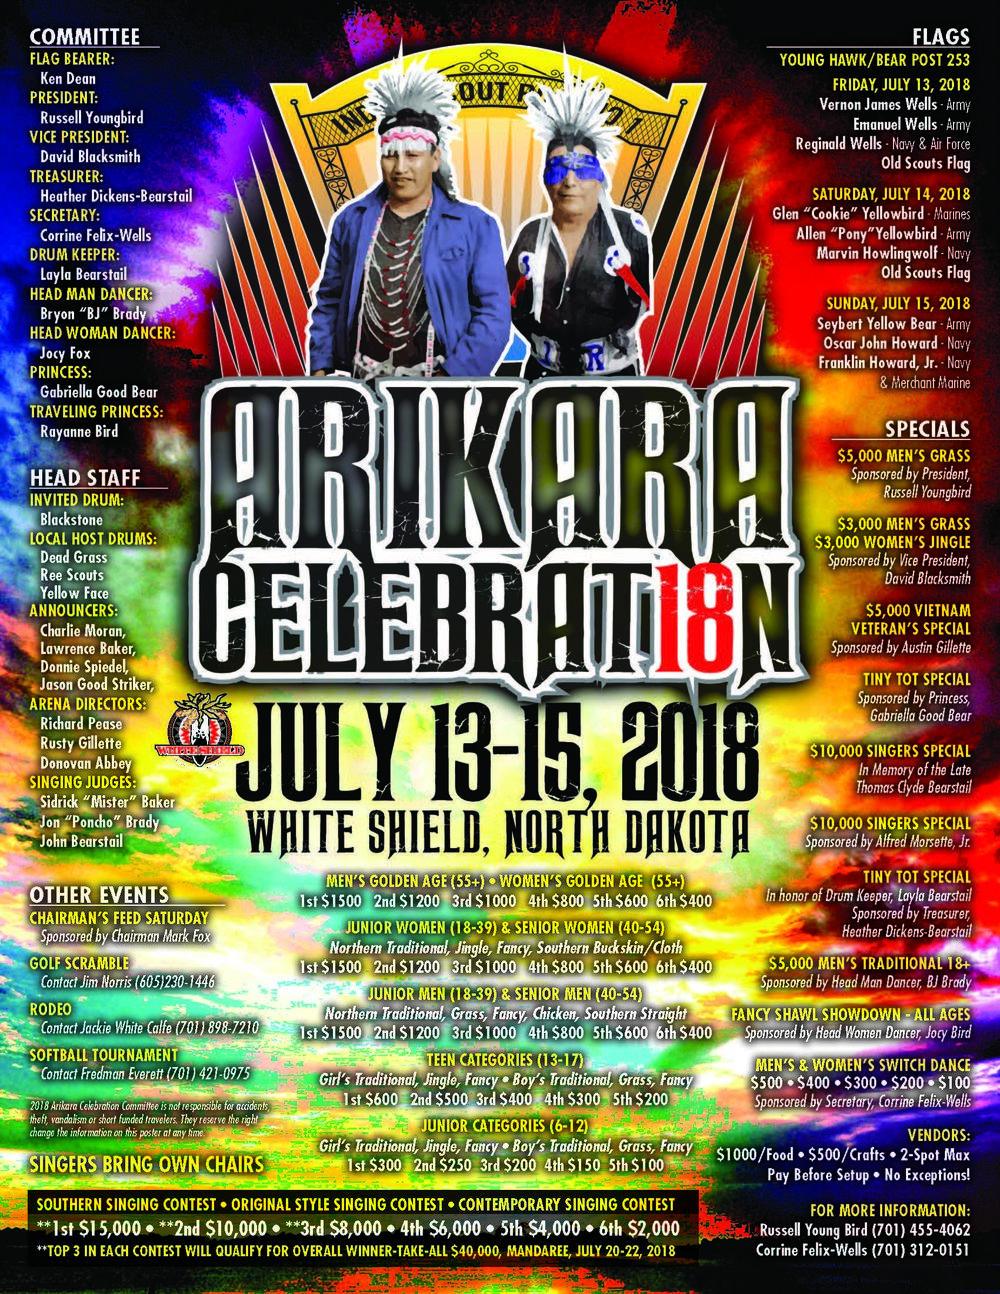 Arikara White Shield Segment Celebration July 13-15, 2018.jpg